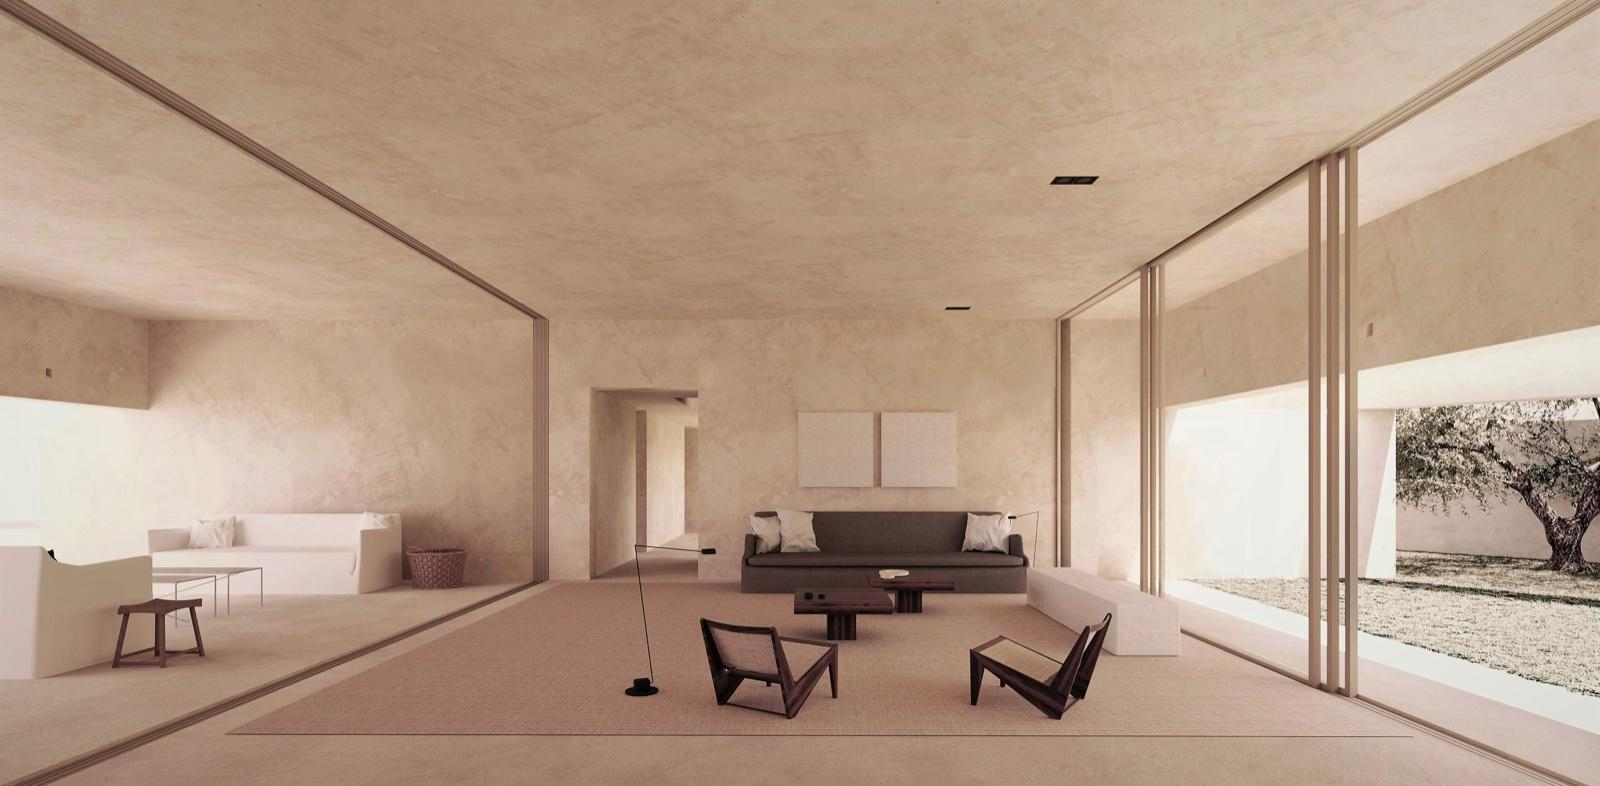 Monochrome interiors-Image-7